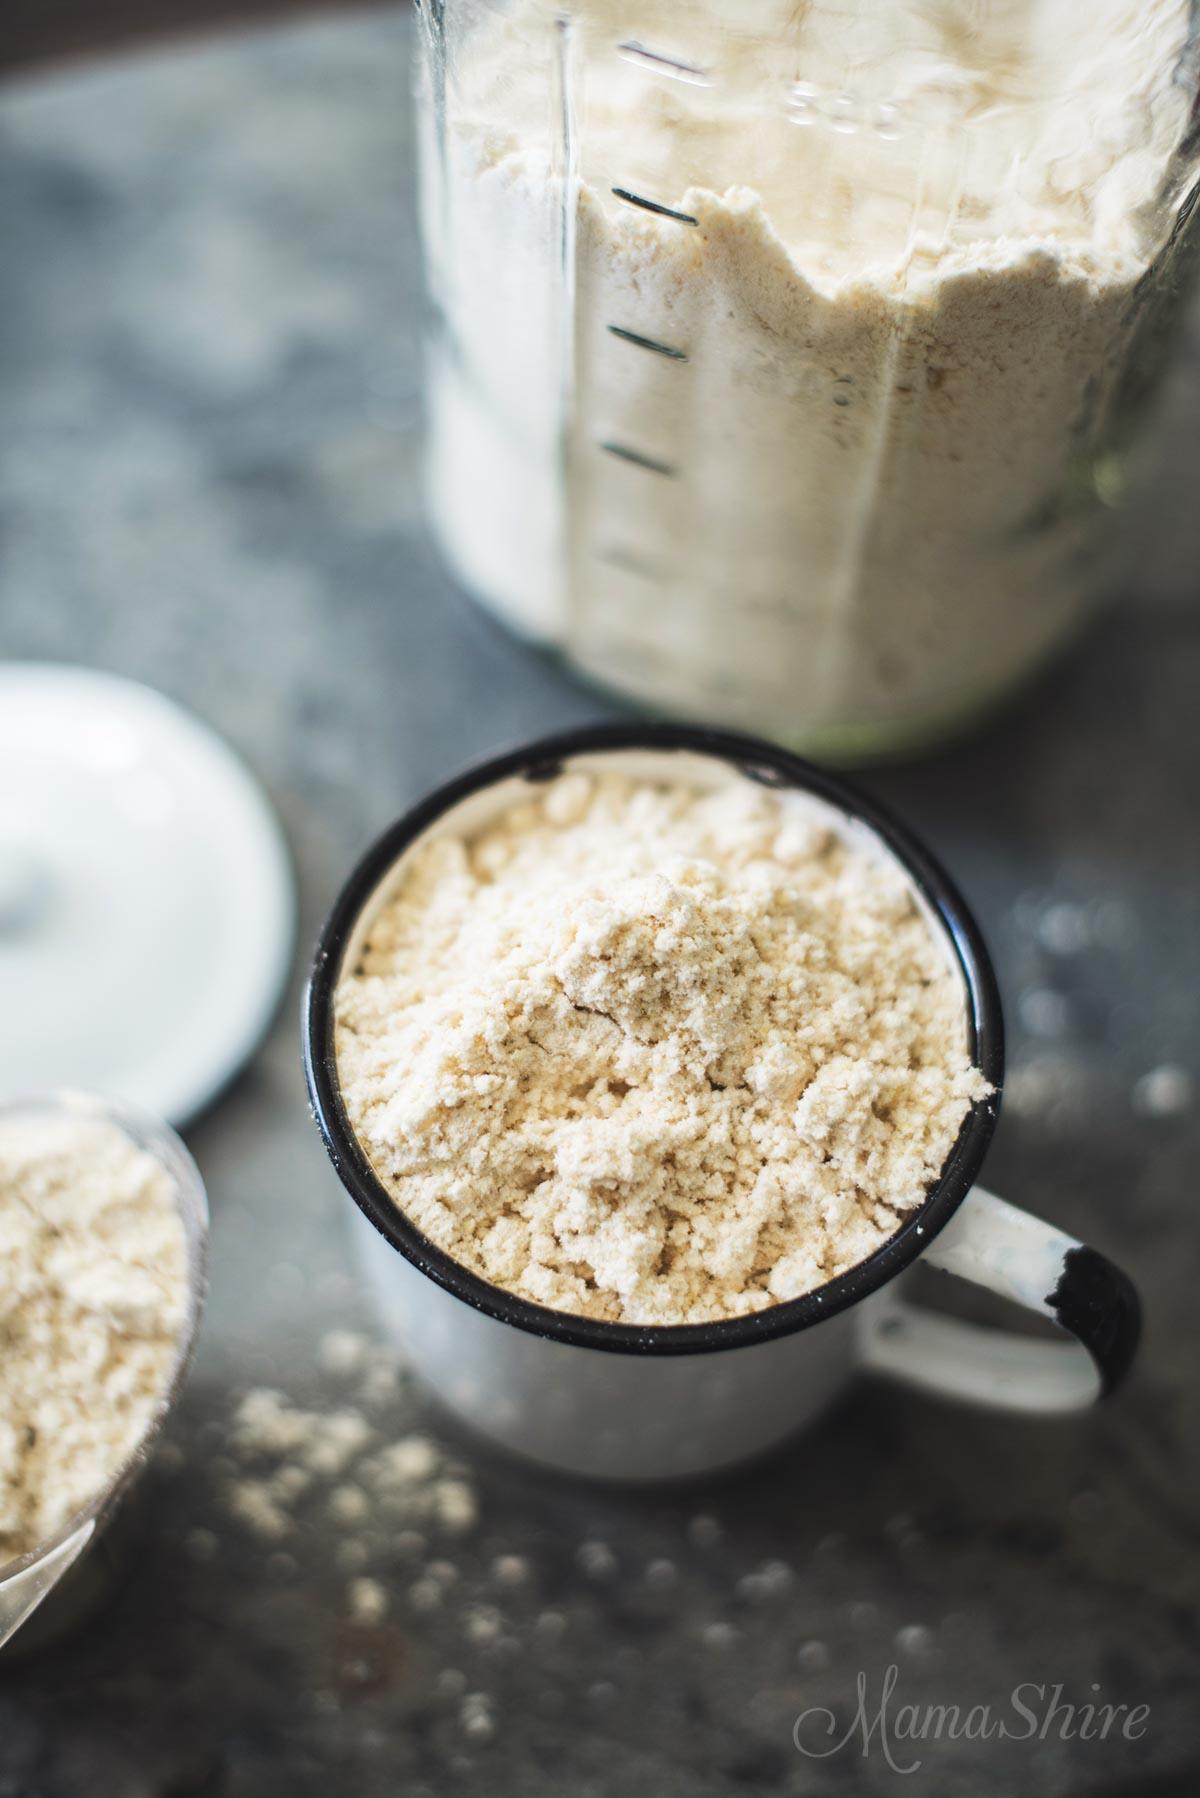 MamaShire's Gluten-Free Baking Blend